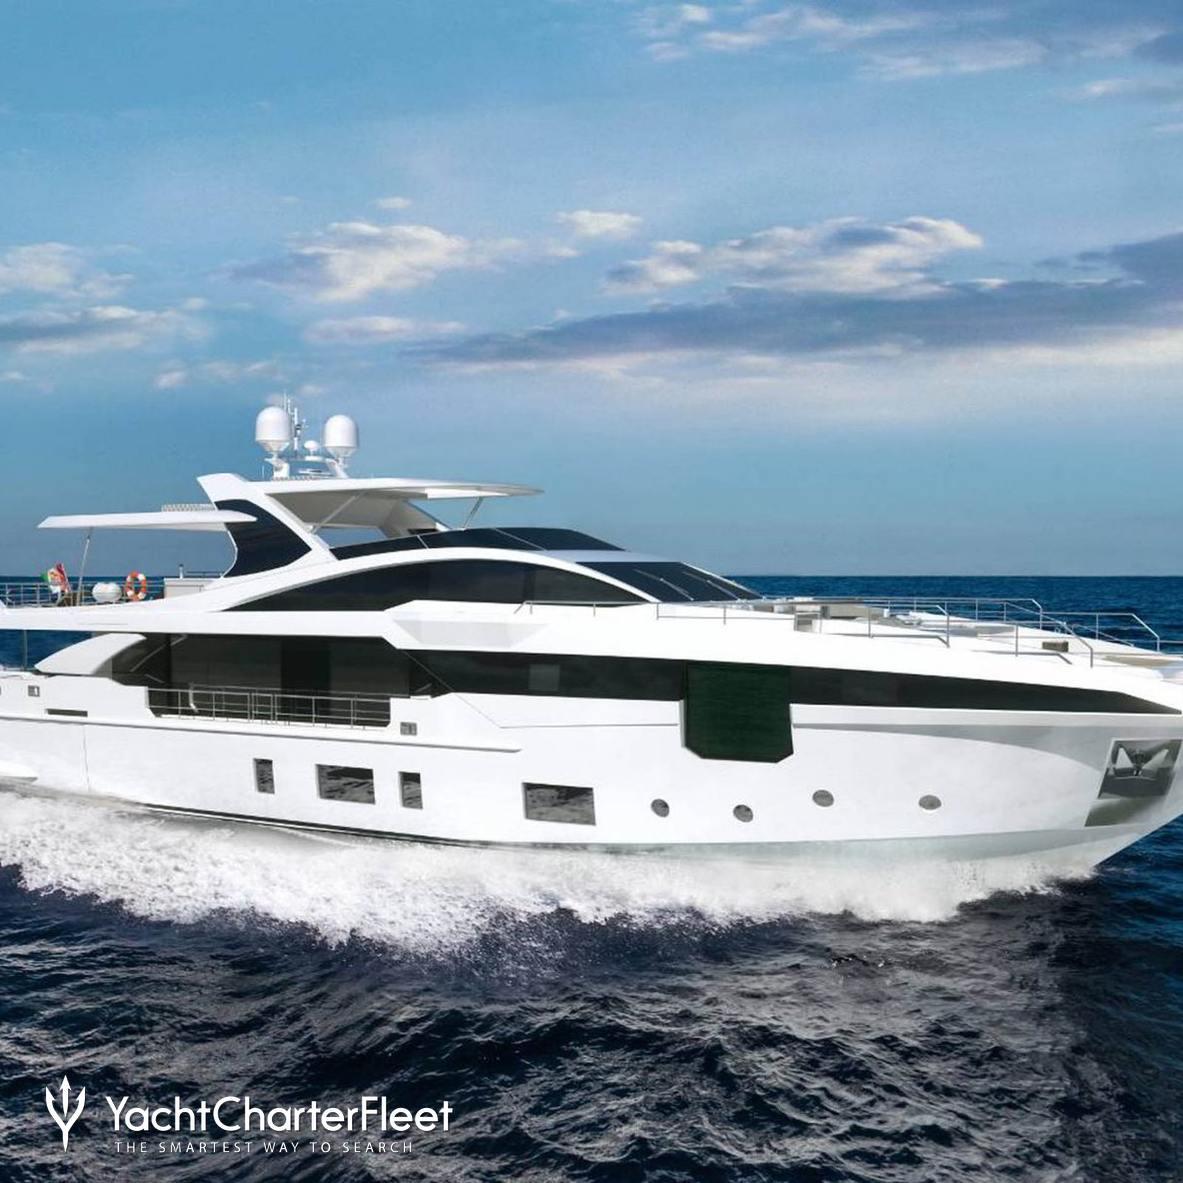 IRYNA Yacht Photos - Azimut | Yacht Charter Fleet